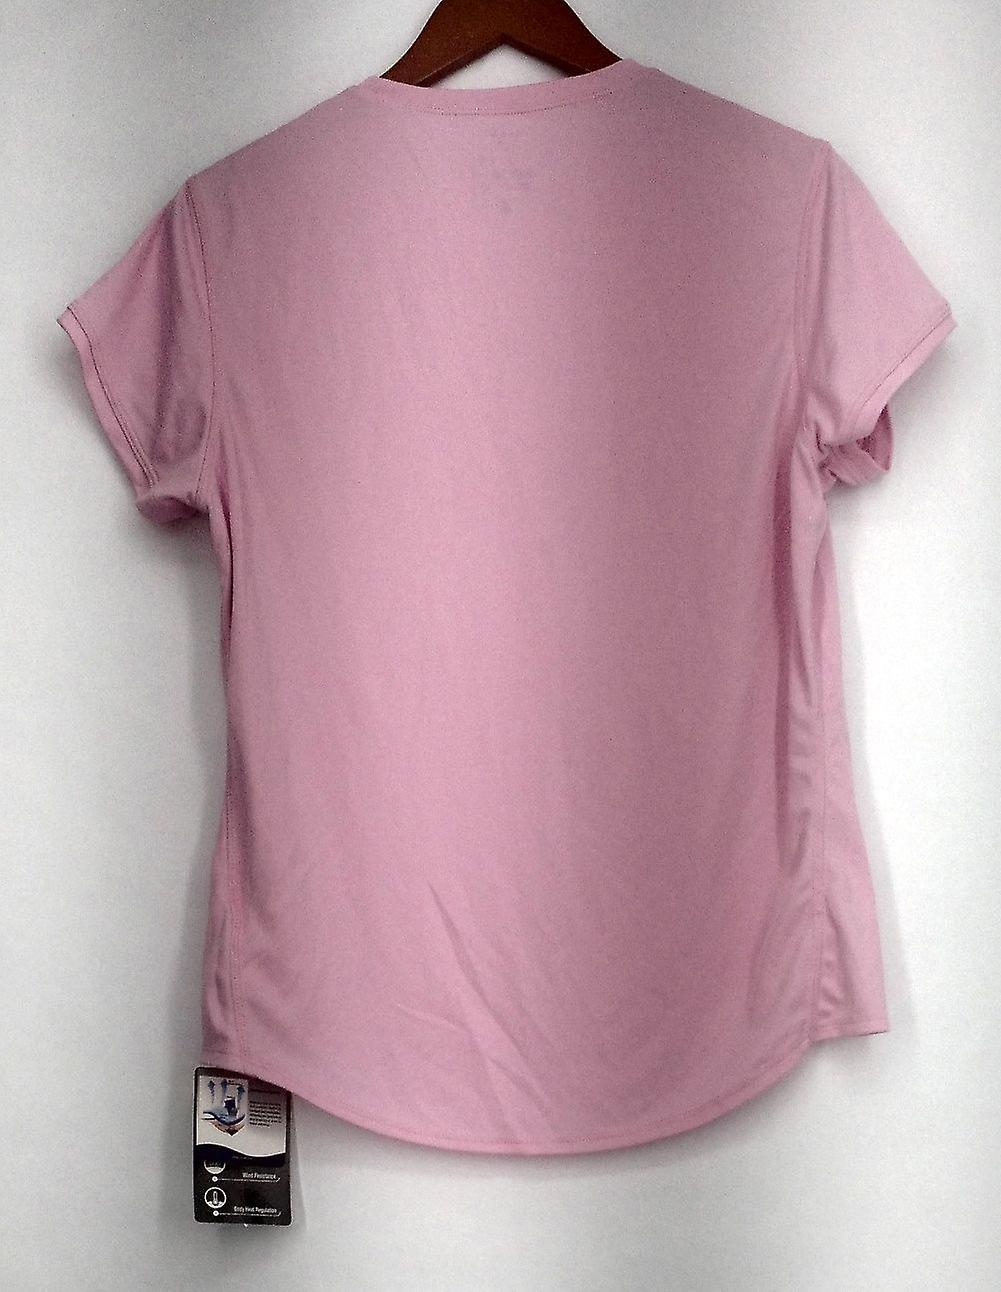 Zorrel Plus Top XXL Short Sleeve w/ Wind Resistance Pink Womens PTC